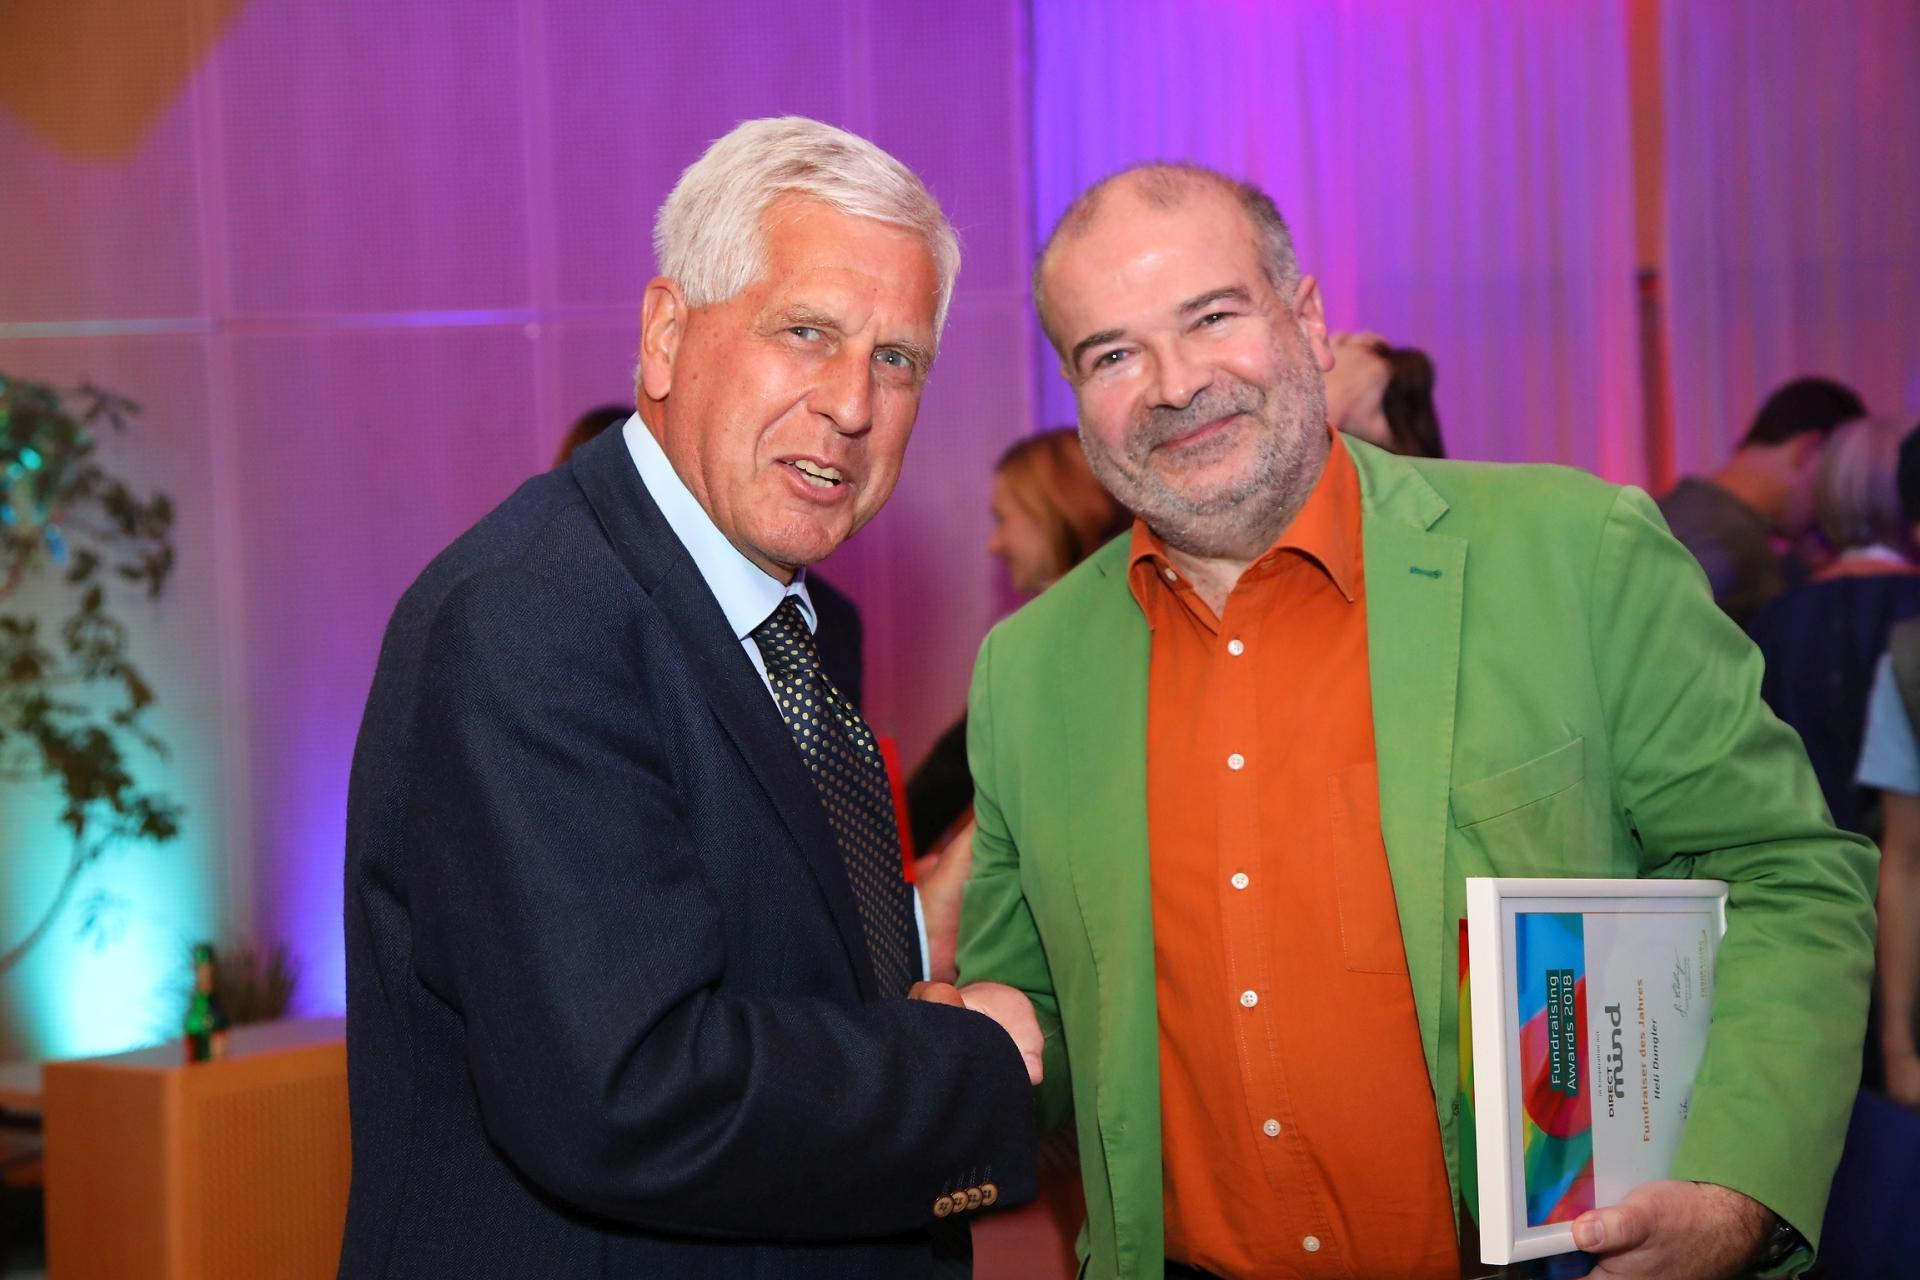 Franz Küberl (langjähriger Präsident Caritas Österreich) mit Heli Dungler (Fotocredit: Ludwig Schedl)